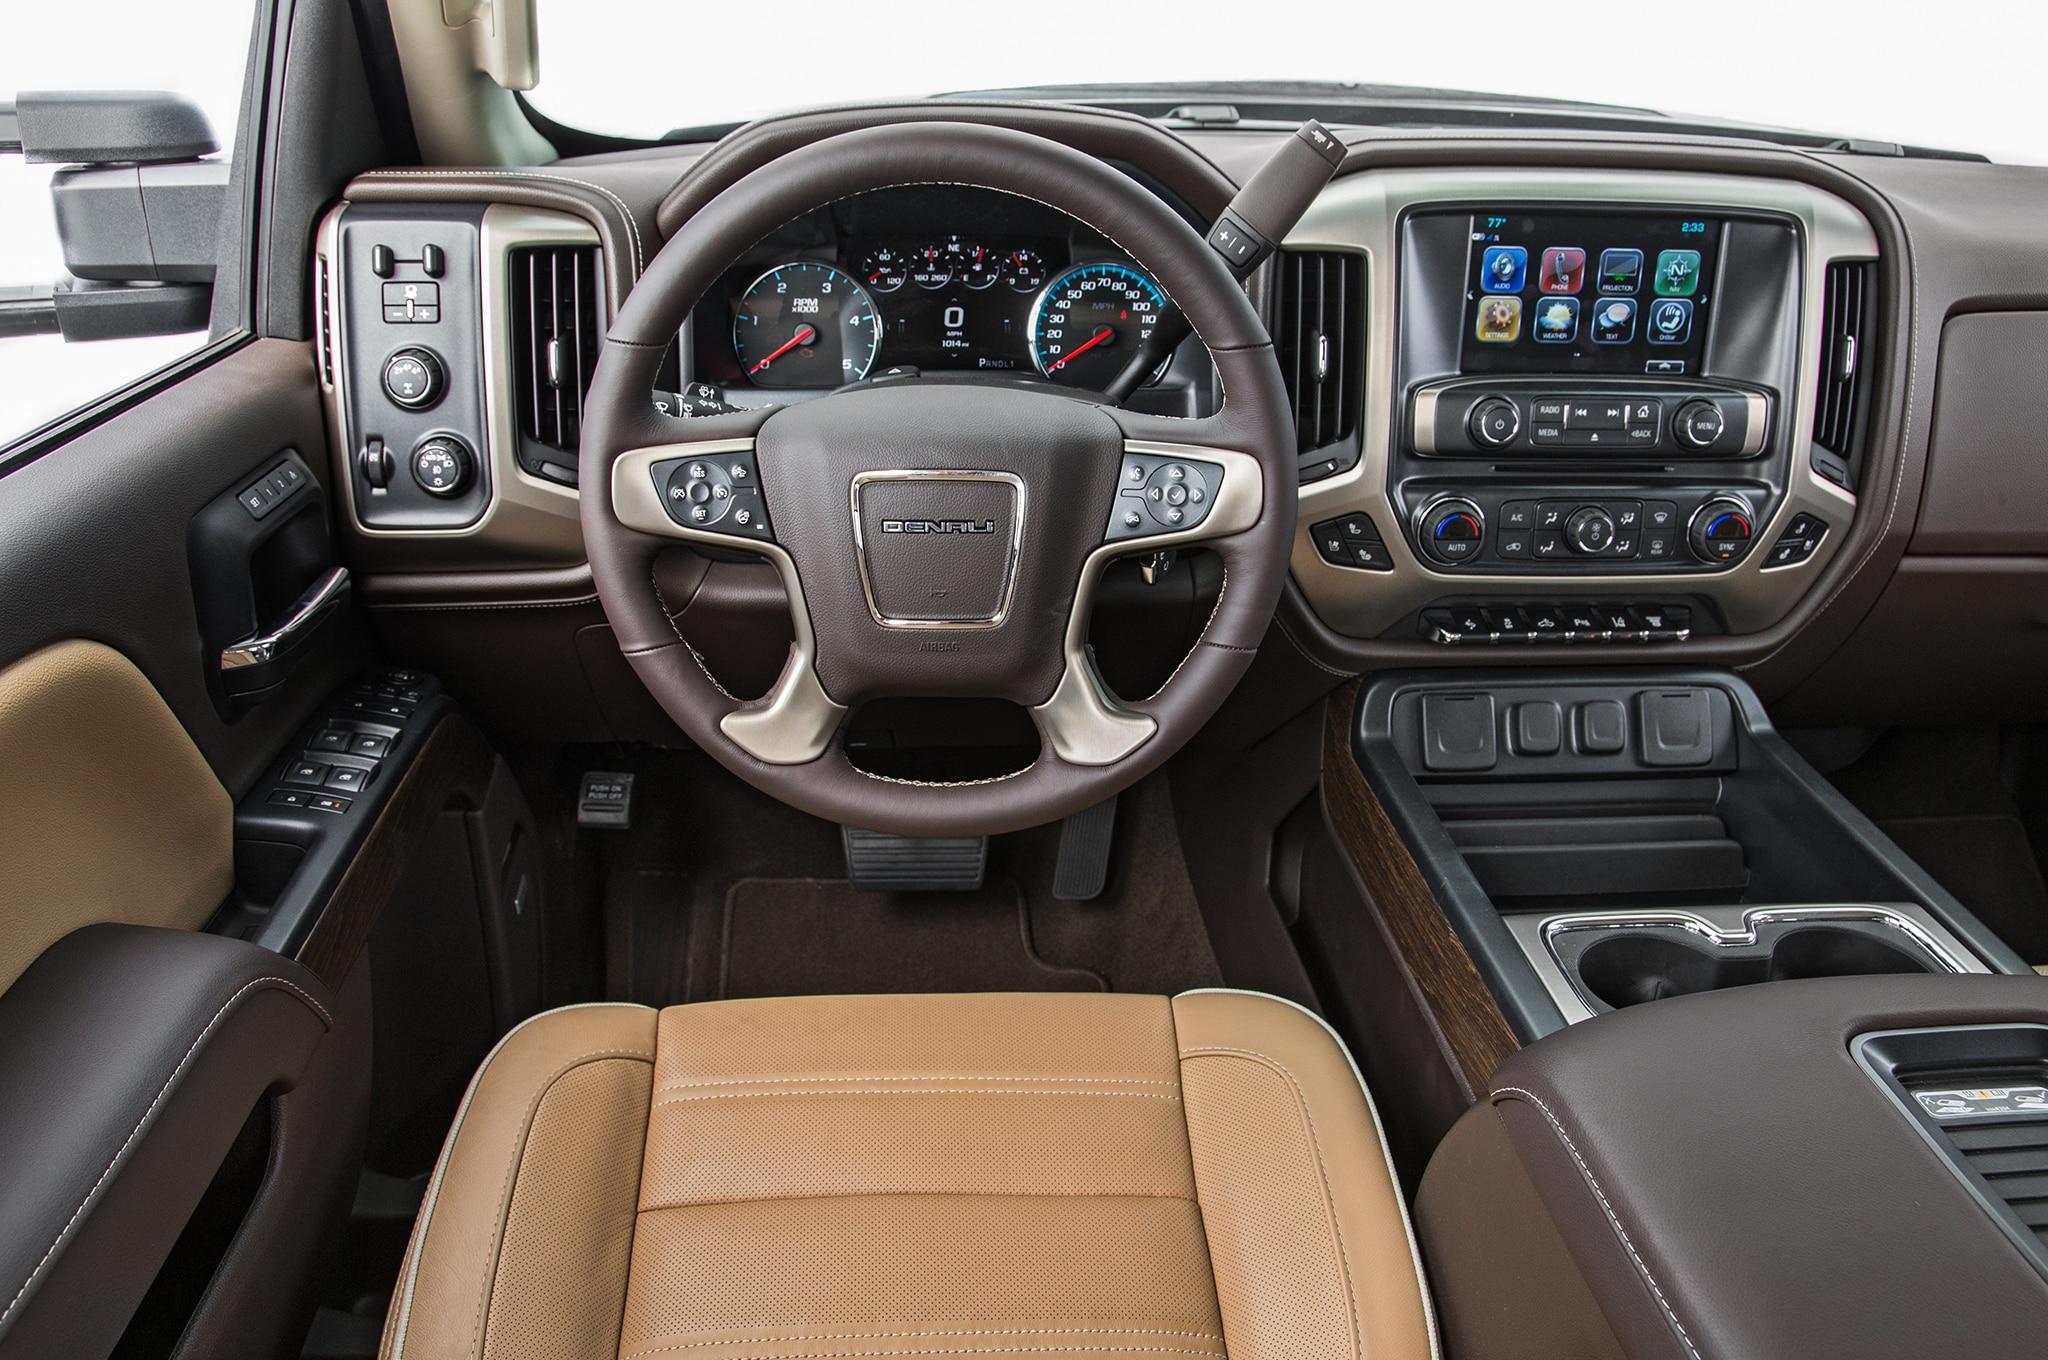 2018 Gmc Sierra Denali Hd Duramax Dashboard Motor Trend